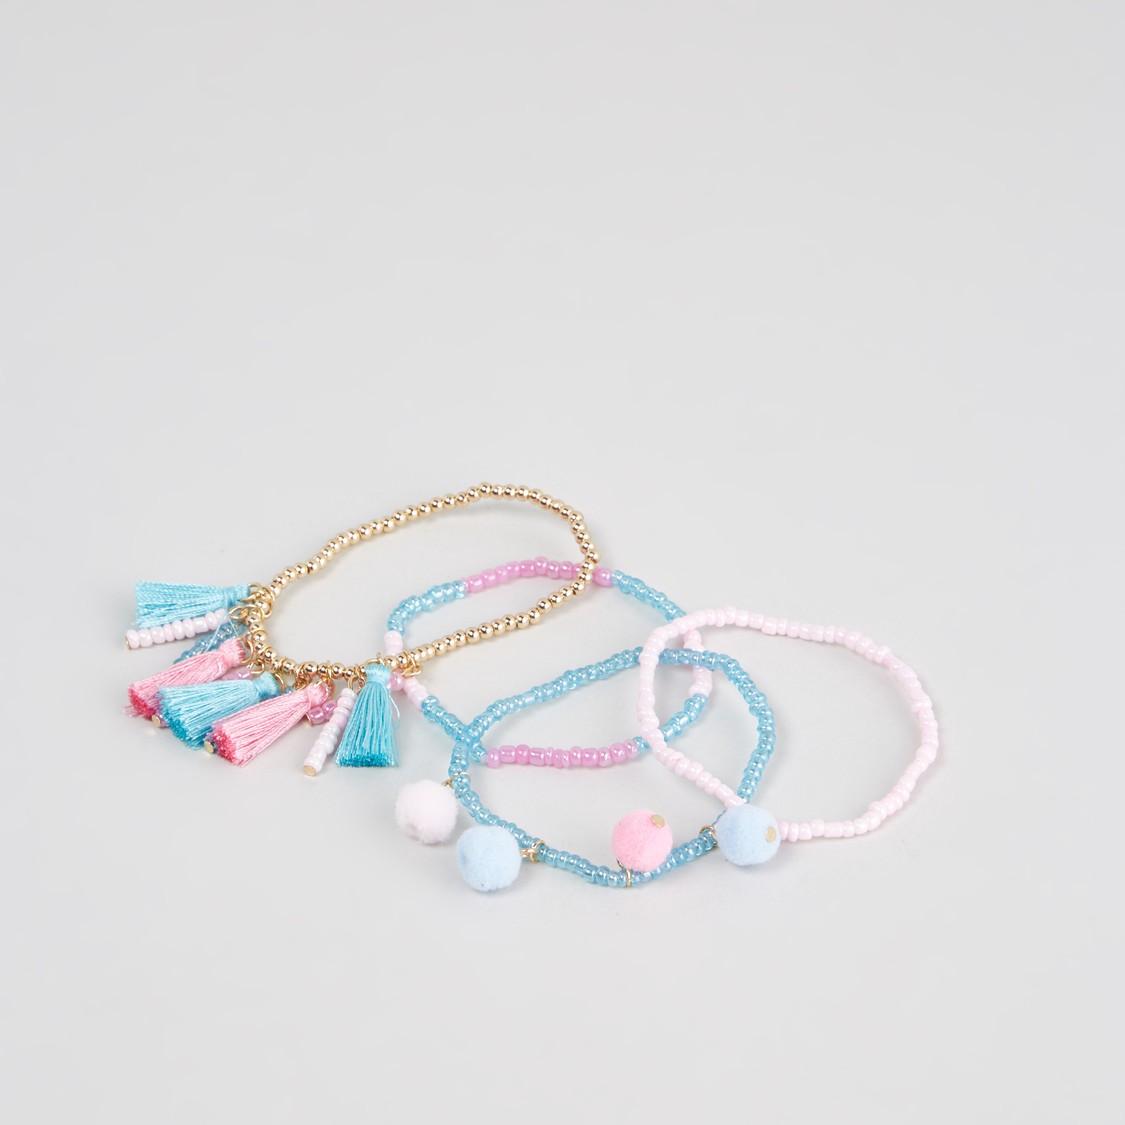 Set of 4 - Beaded Bracelets with Tassels and Pom Pom Detail